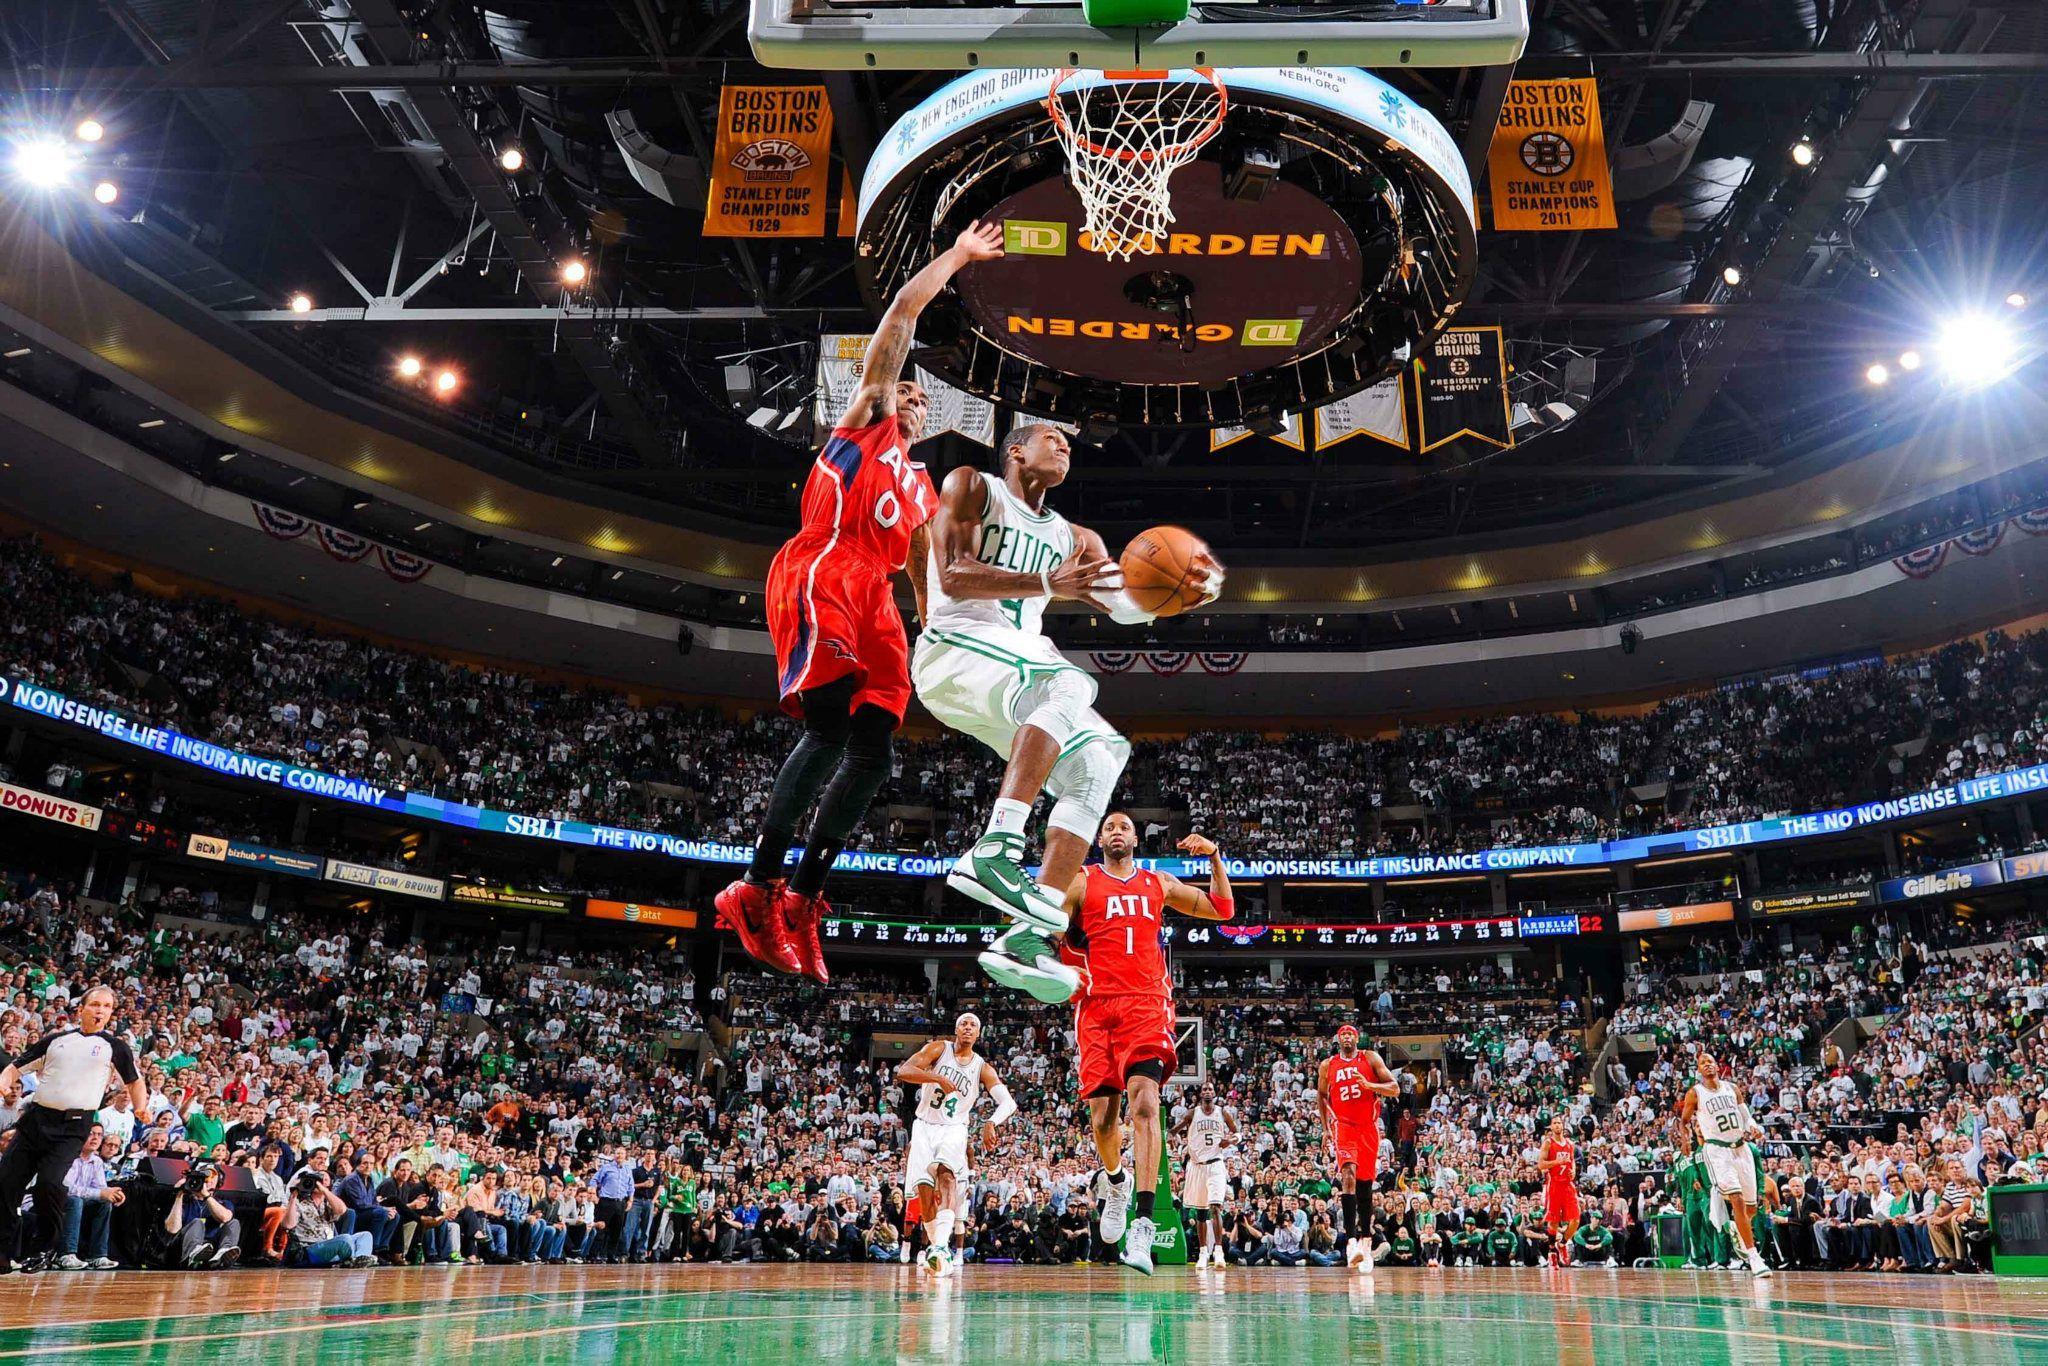 NBA playoffs 2012 Nba playoffs, Fun sports, Nba